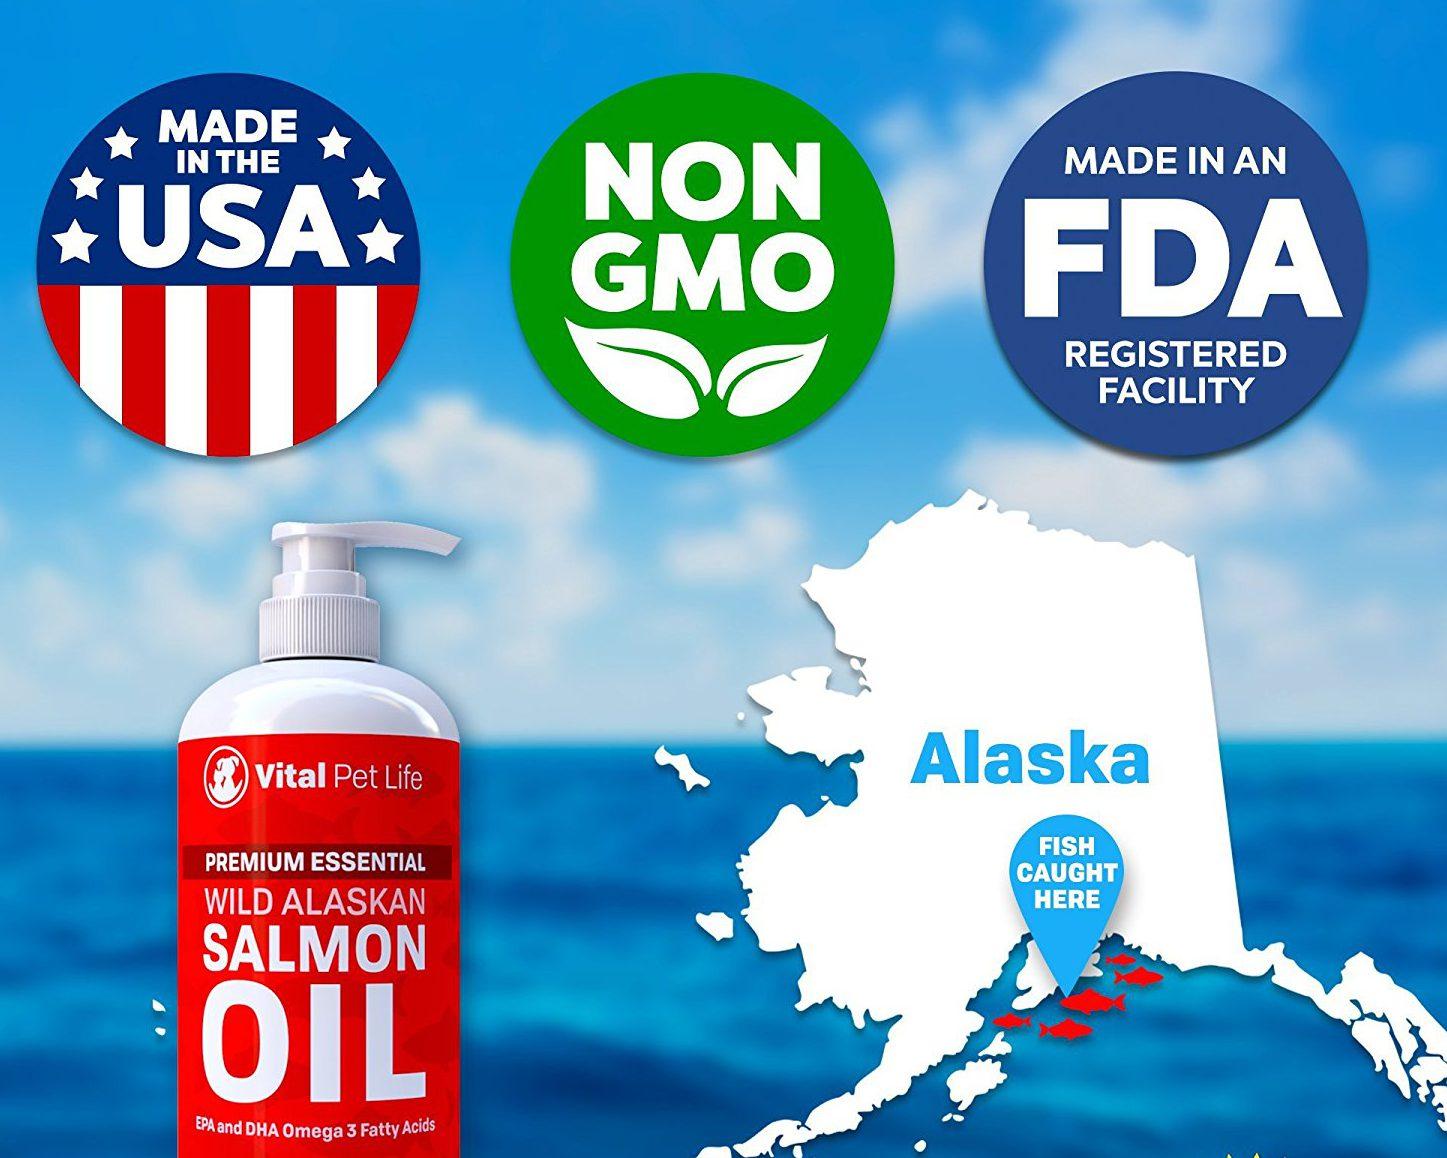 wild alaskan salmon oil--Good For Ferrets?